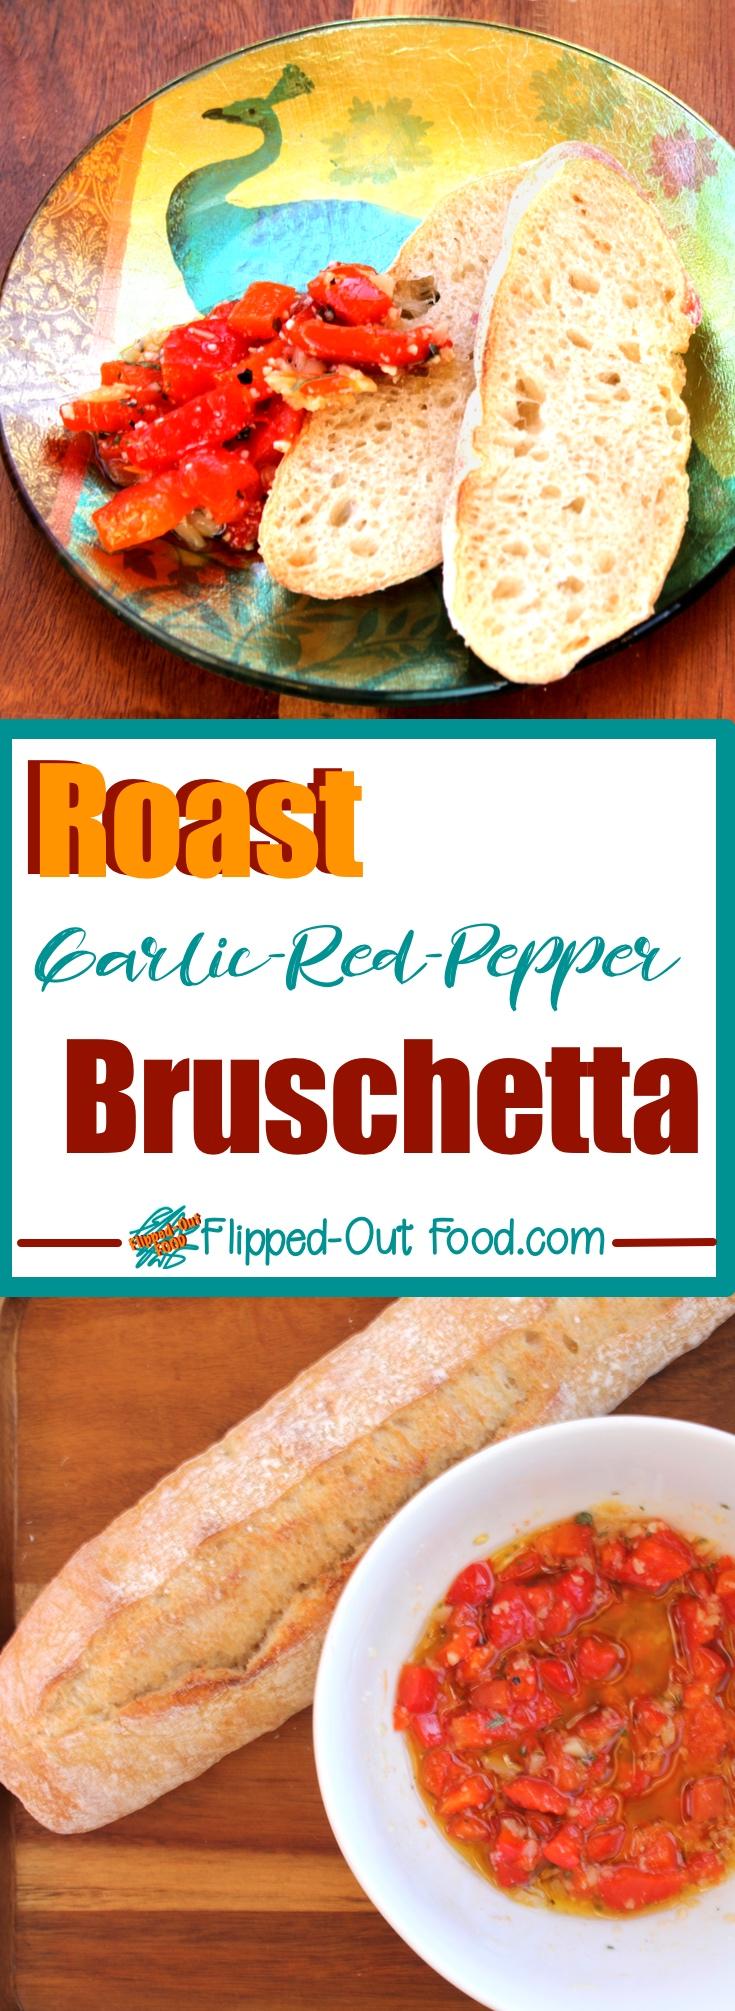 roast garlic red pepper bruschetta pin collage